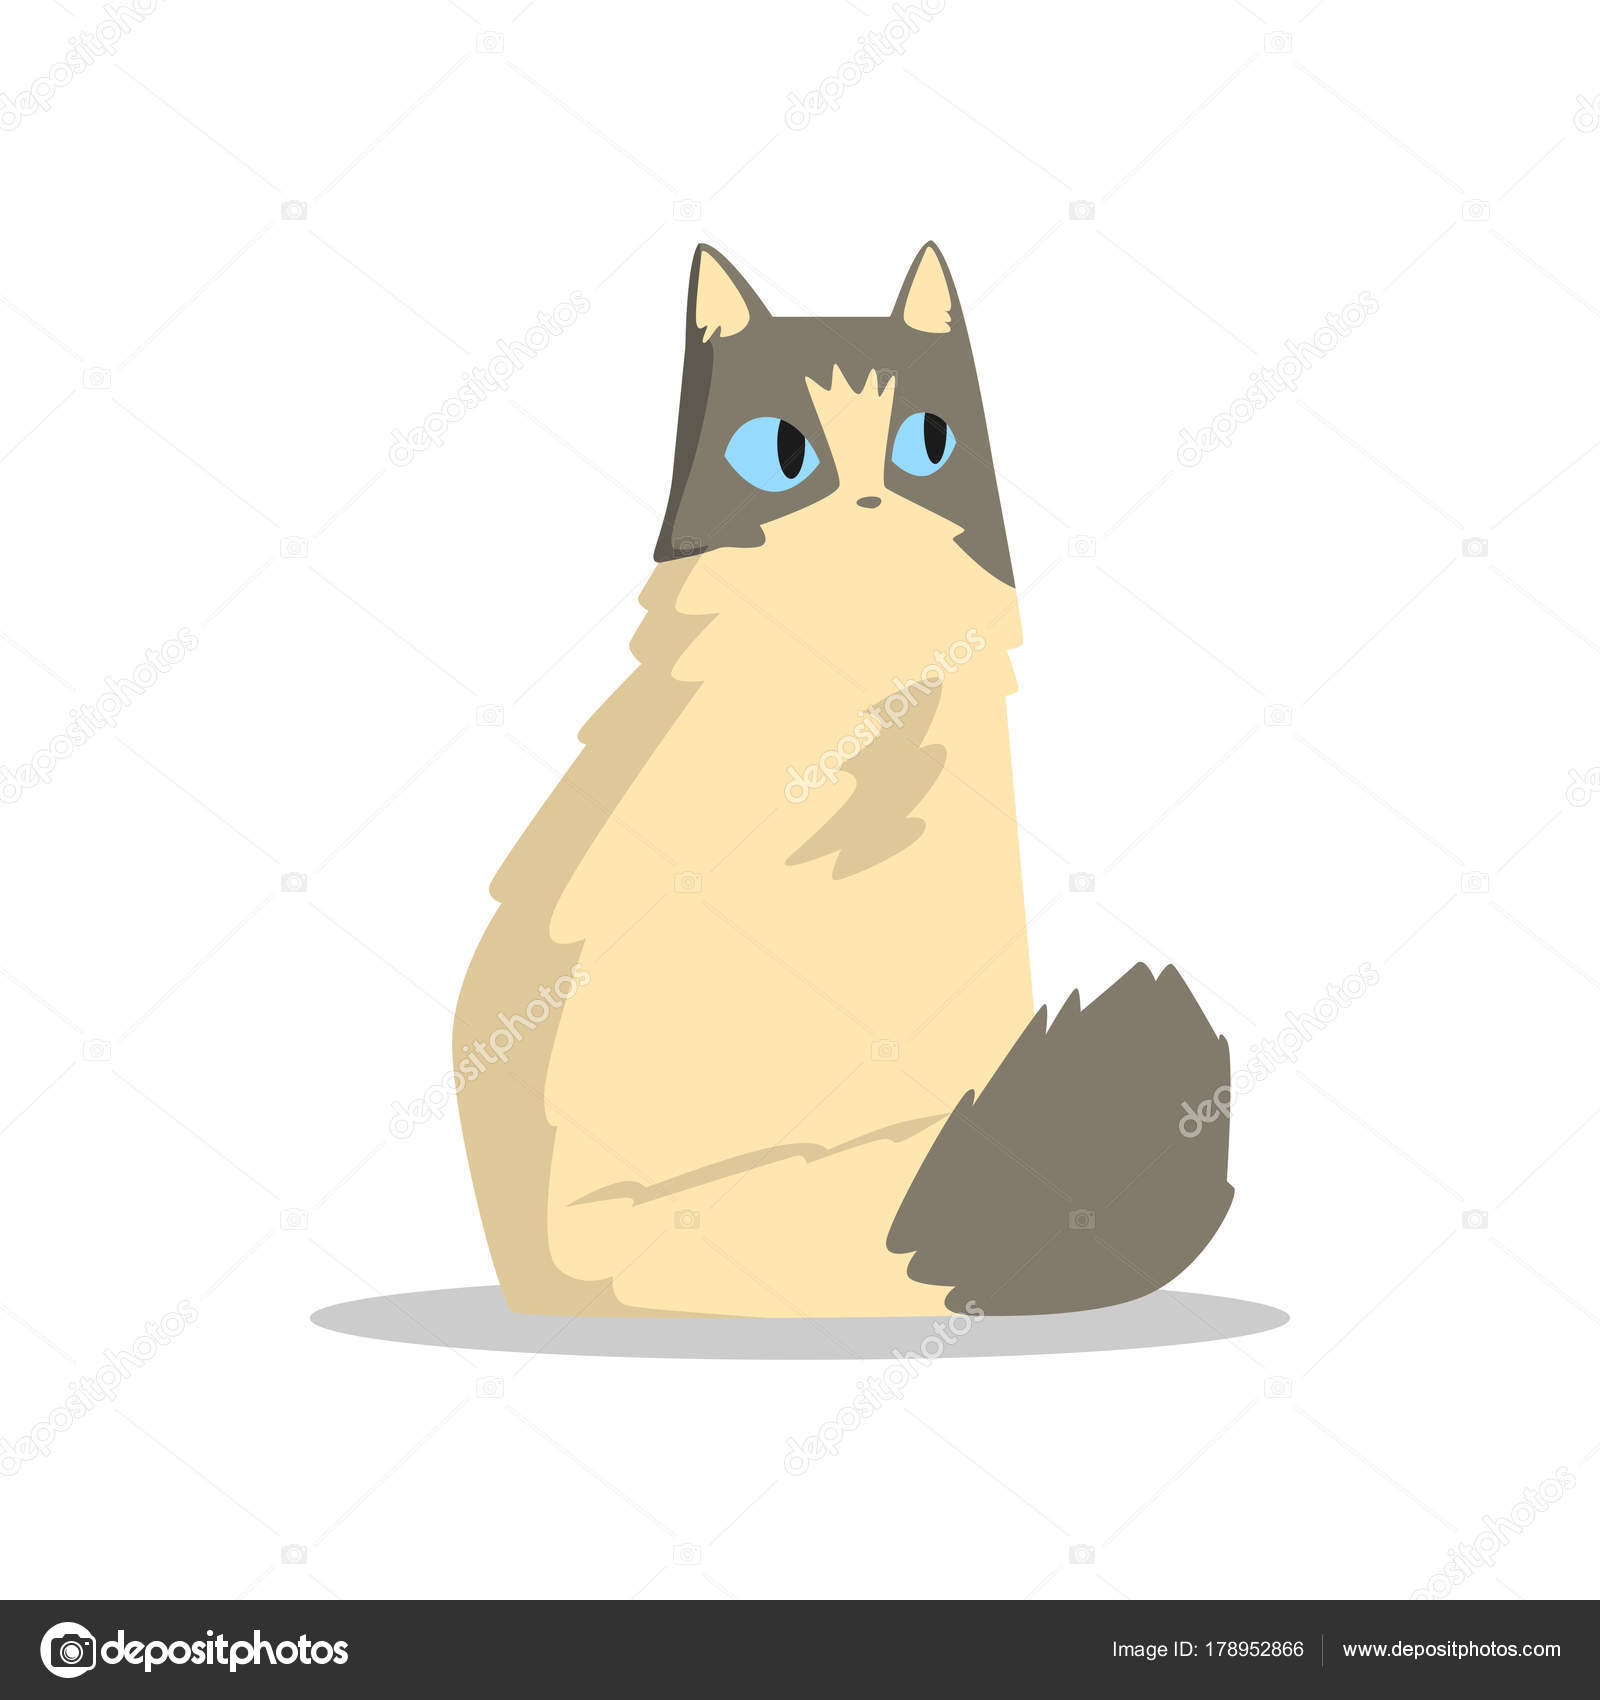 Immagini: puffy cat cartoon. buffo gatto puffy beige con macchie